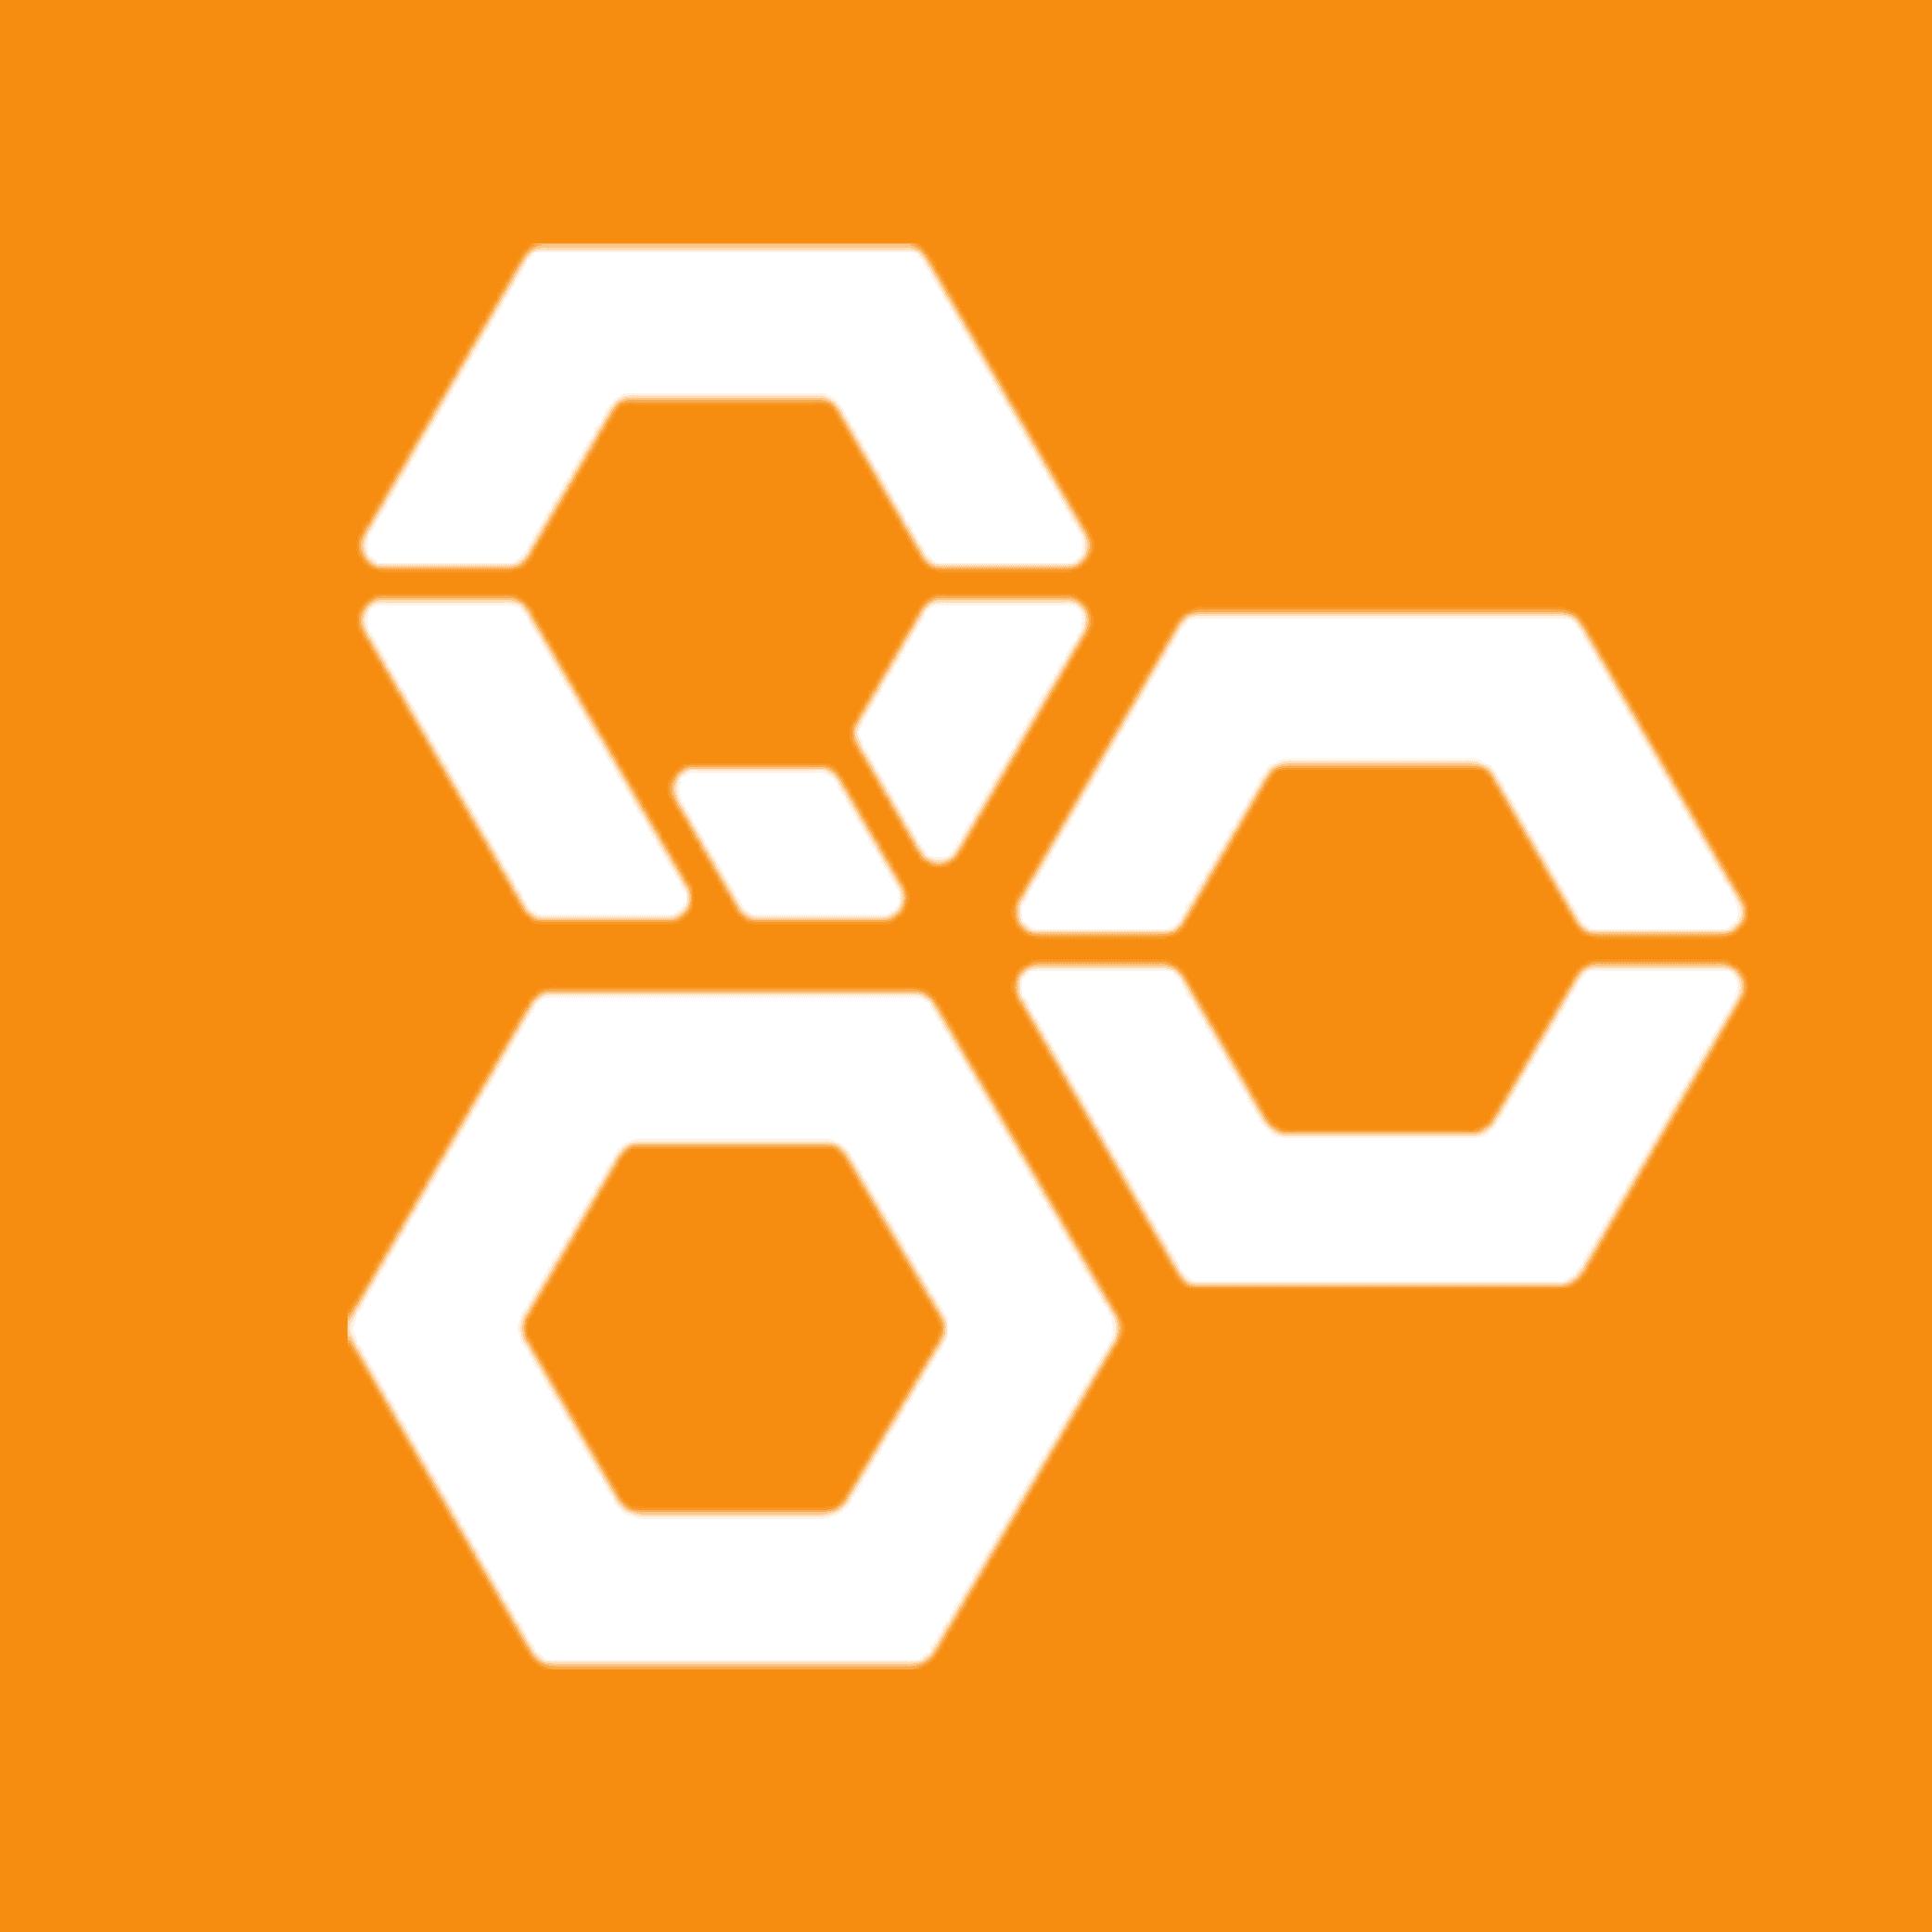 Icon-Well-Architected-orange